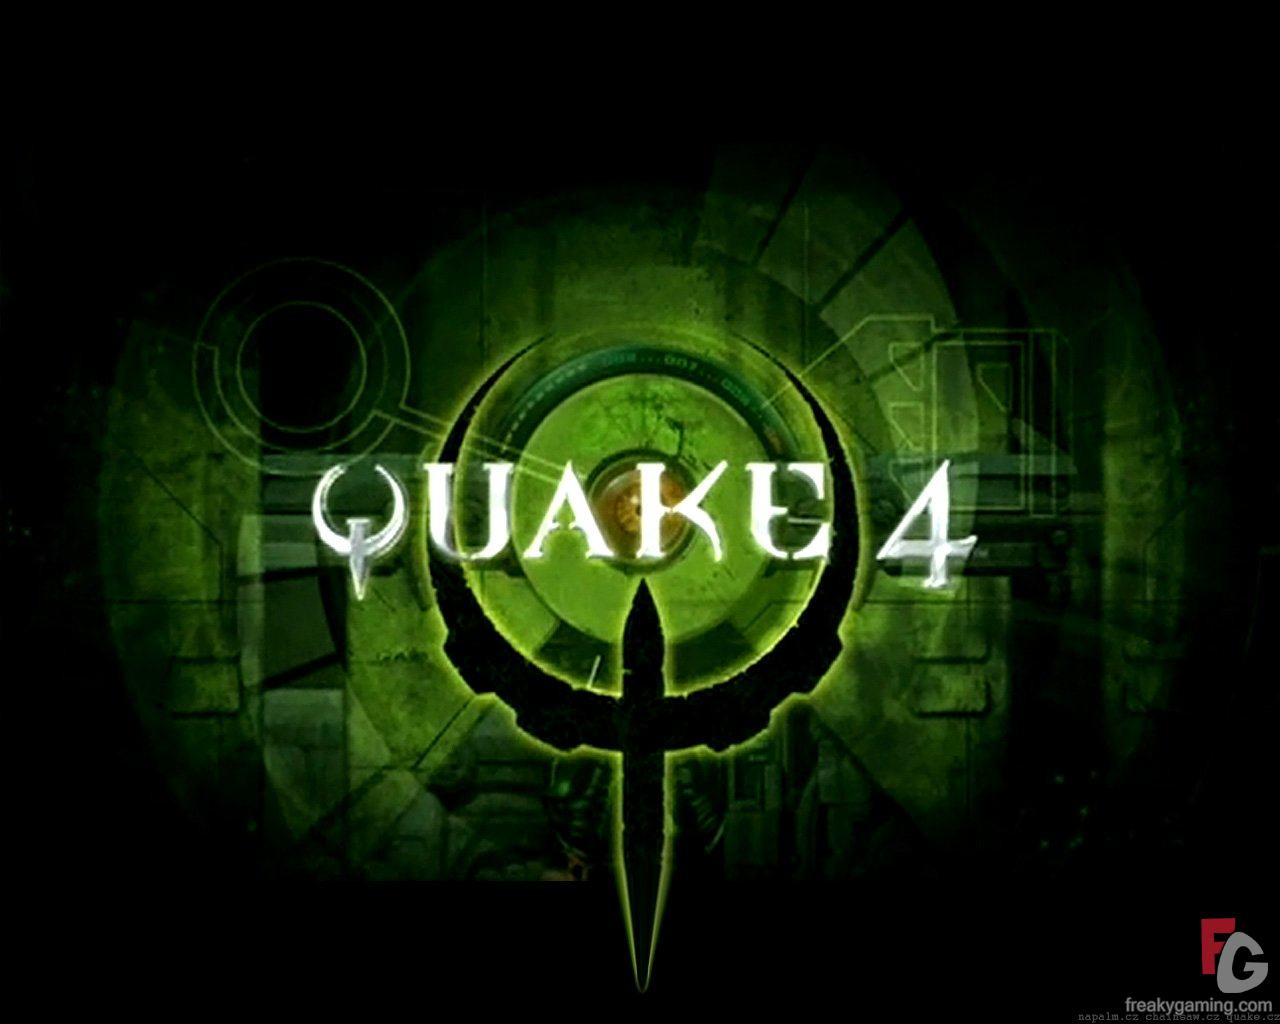 quake 4 logo wallpaper 1280x1024